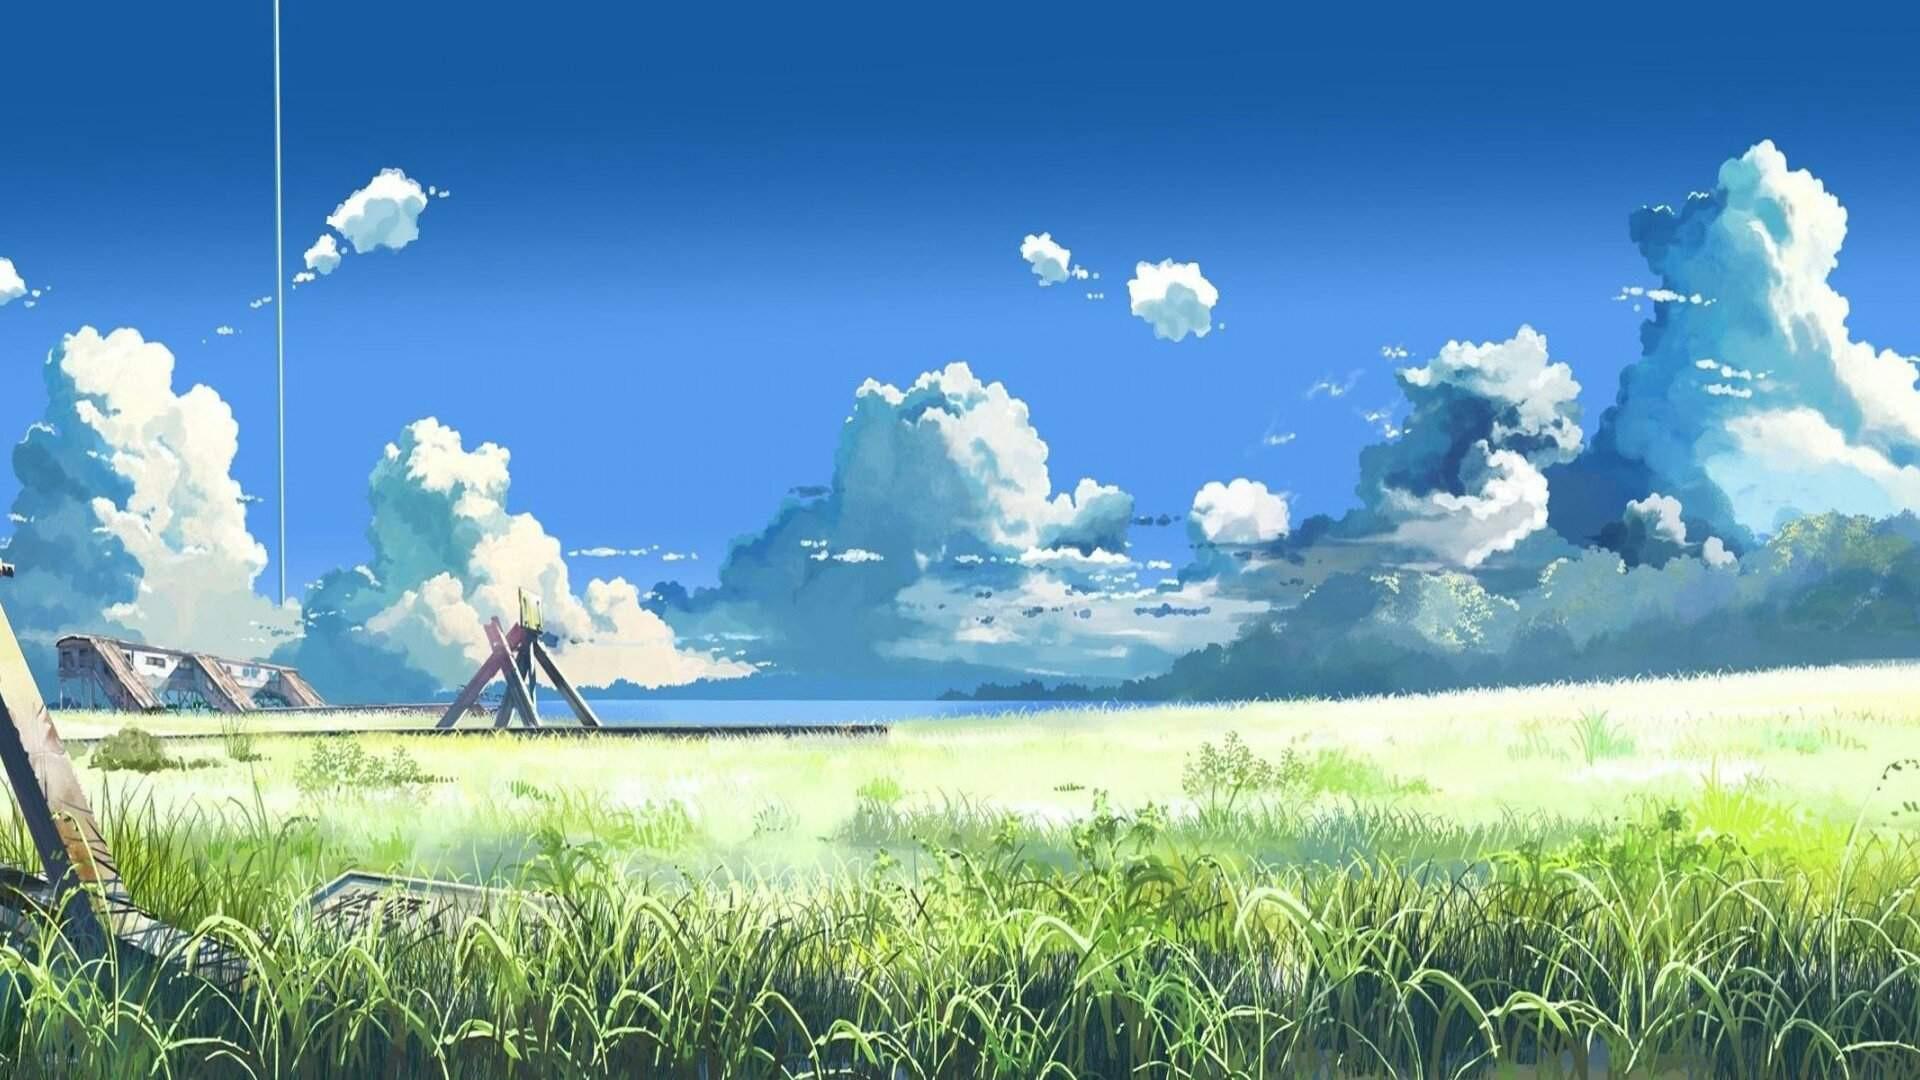 Anime Cloud wallpaper photo